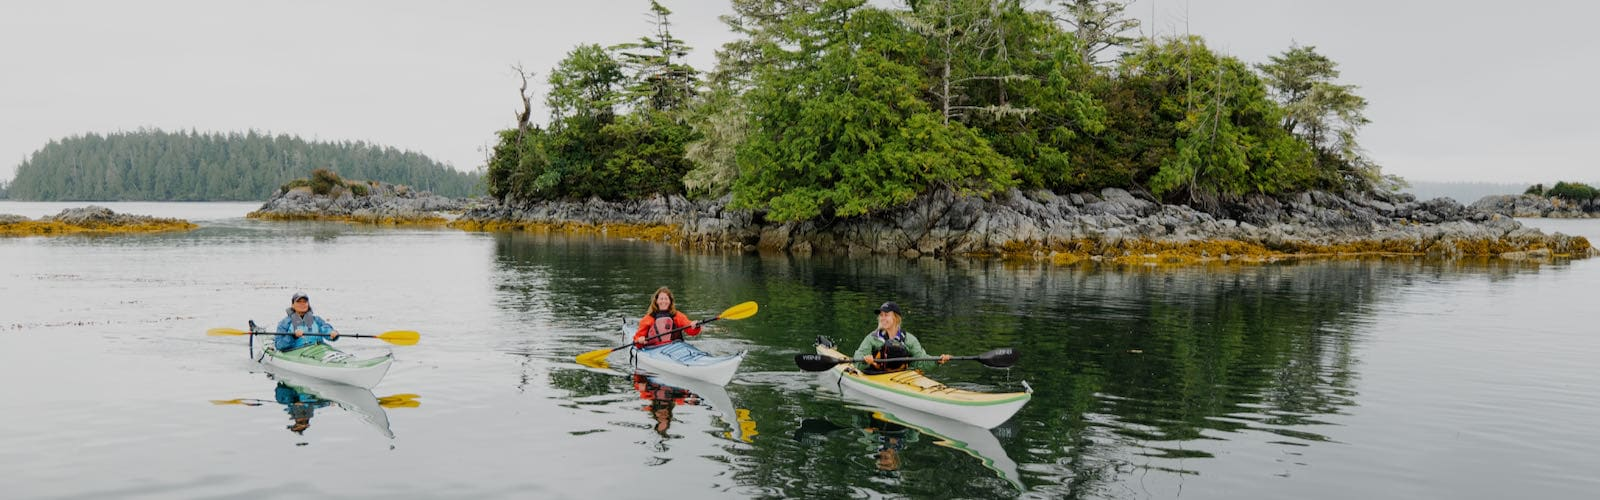 Return to Vancouver Island's Authentic Wild at Secret Beach